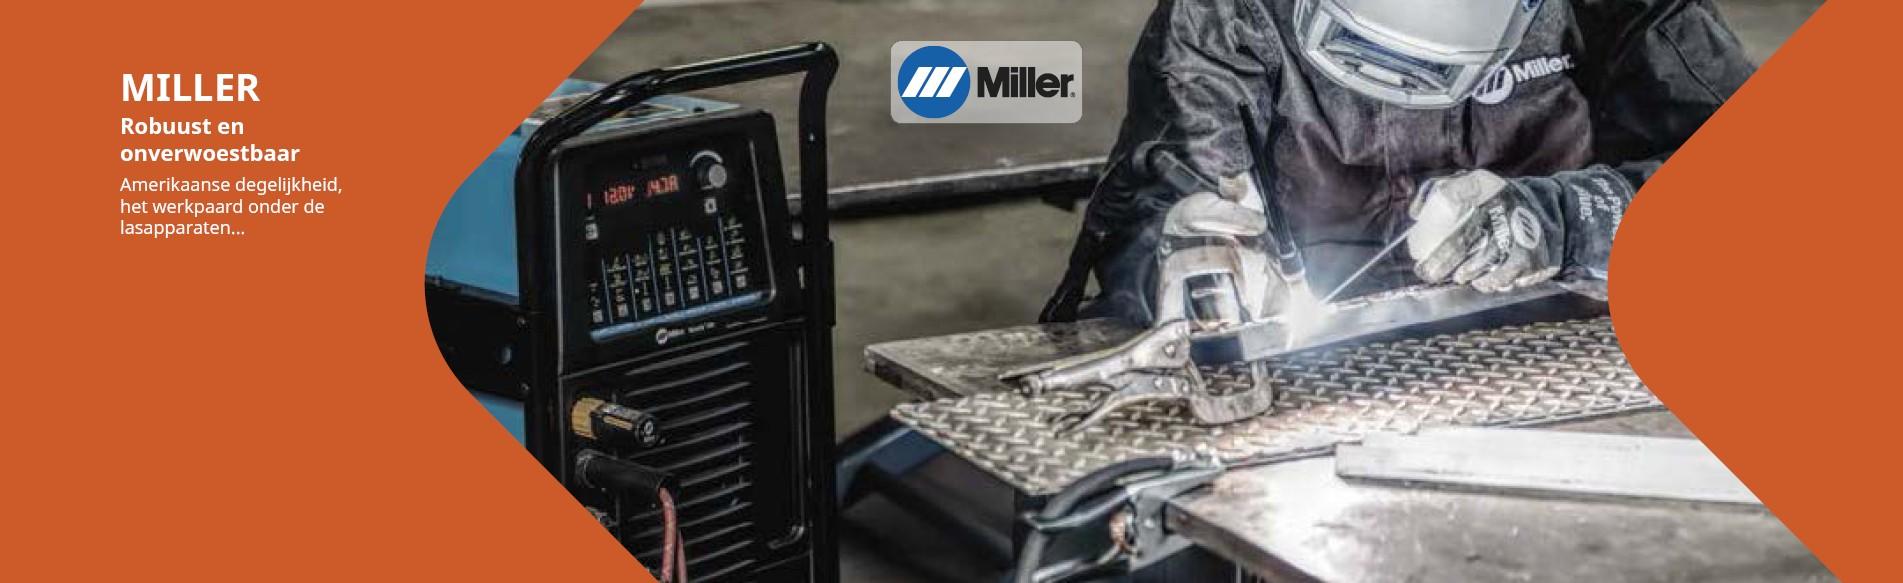 Miller lasapparatuur